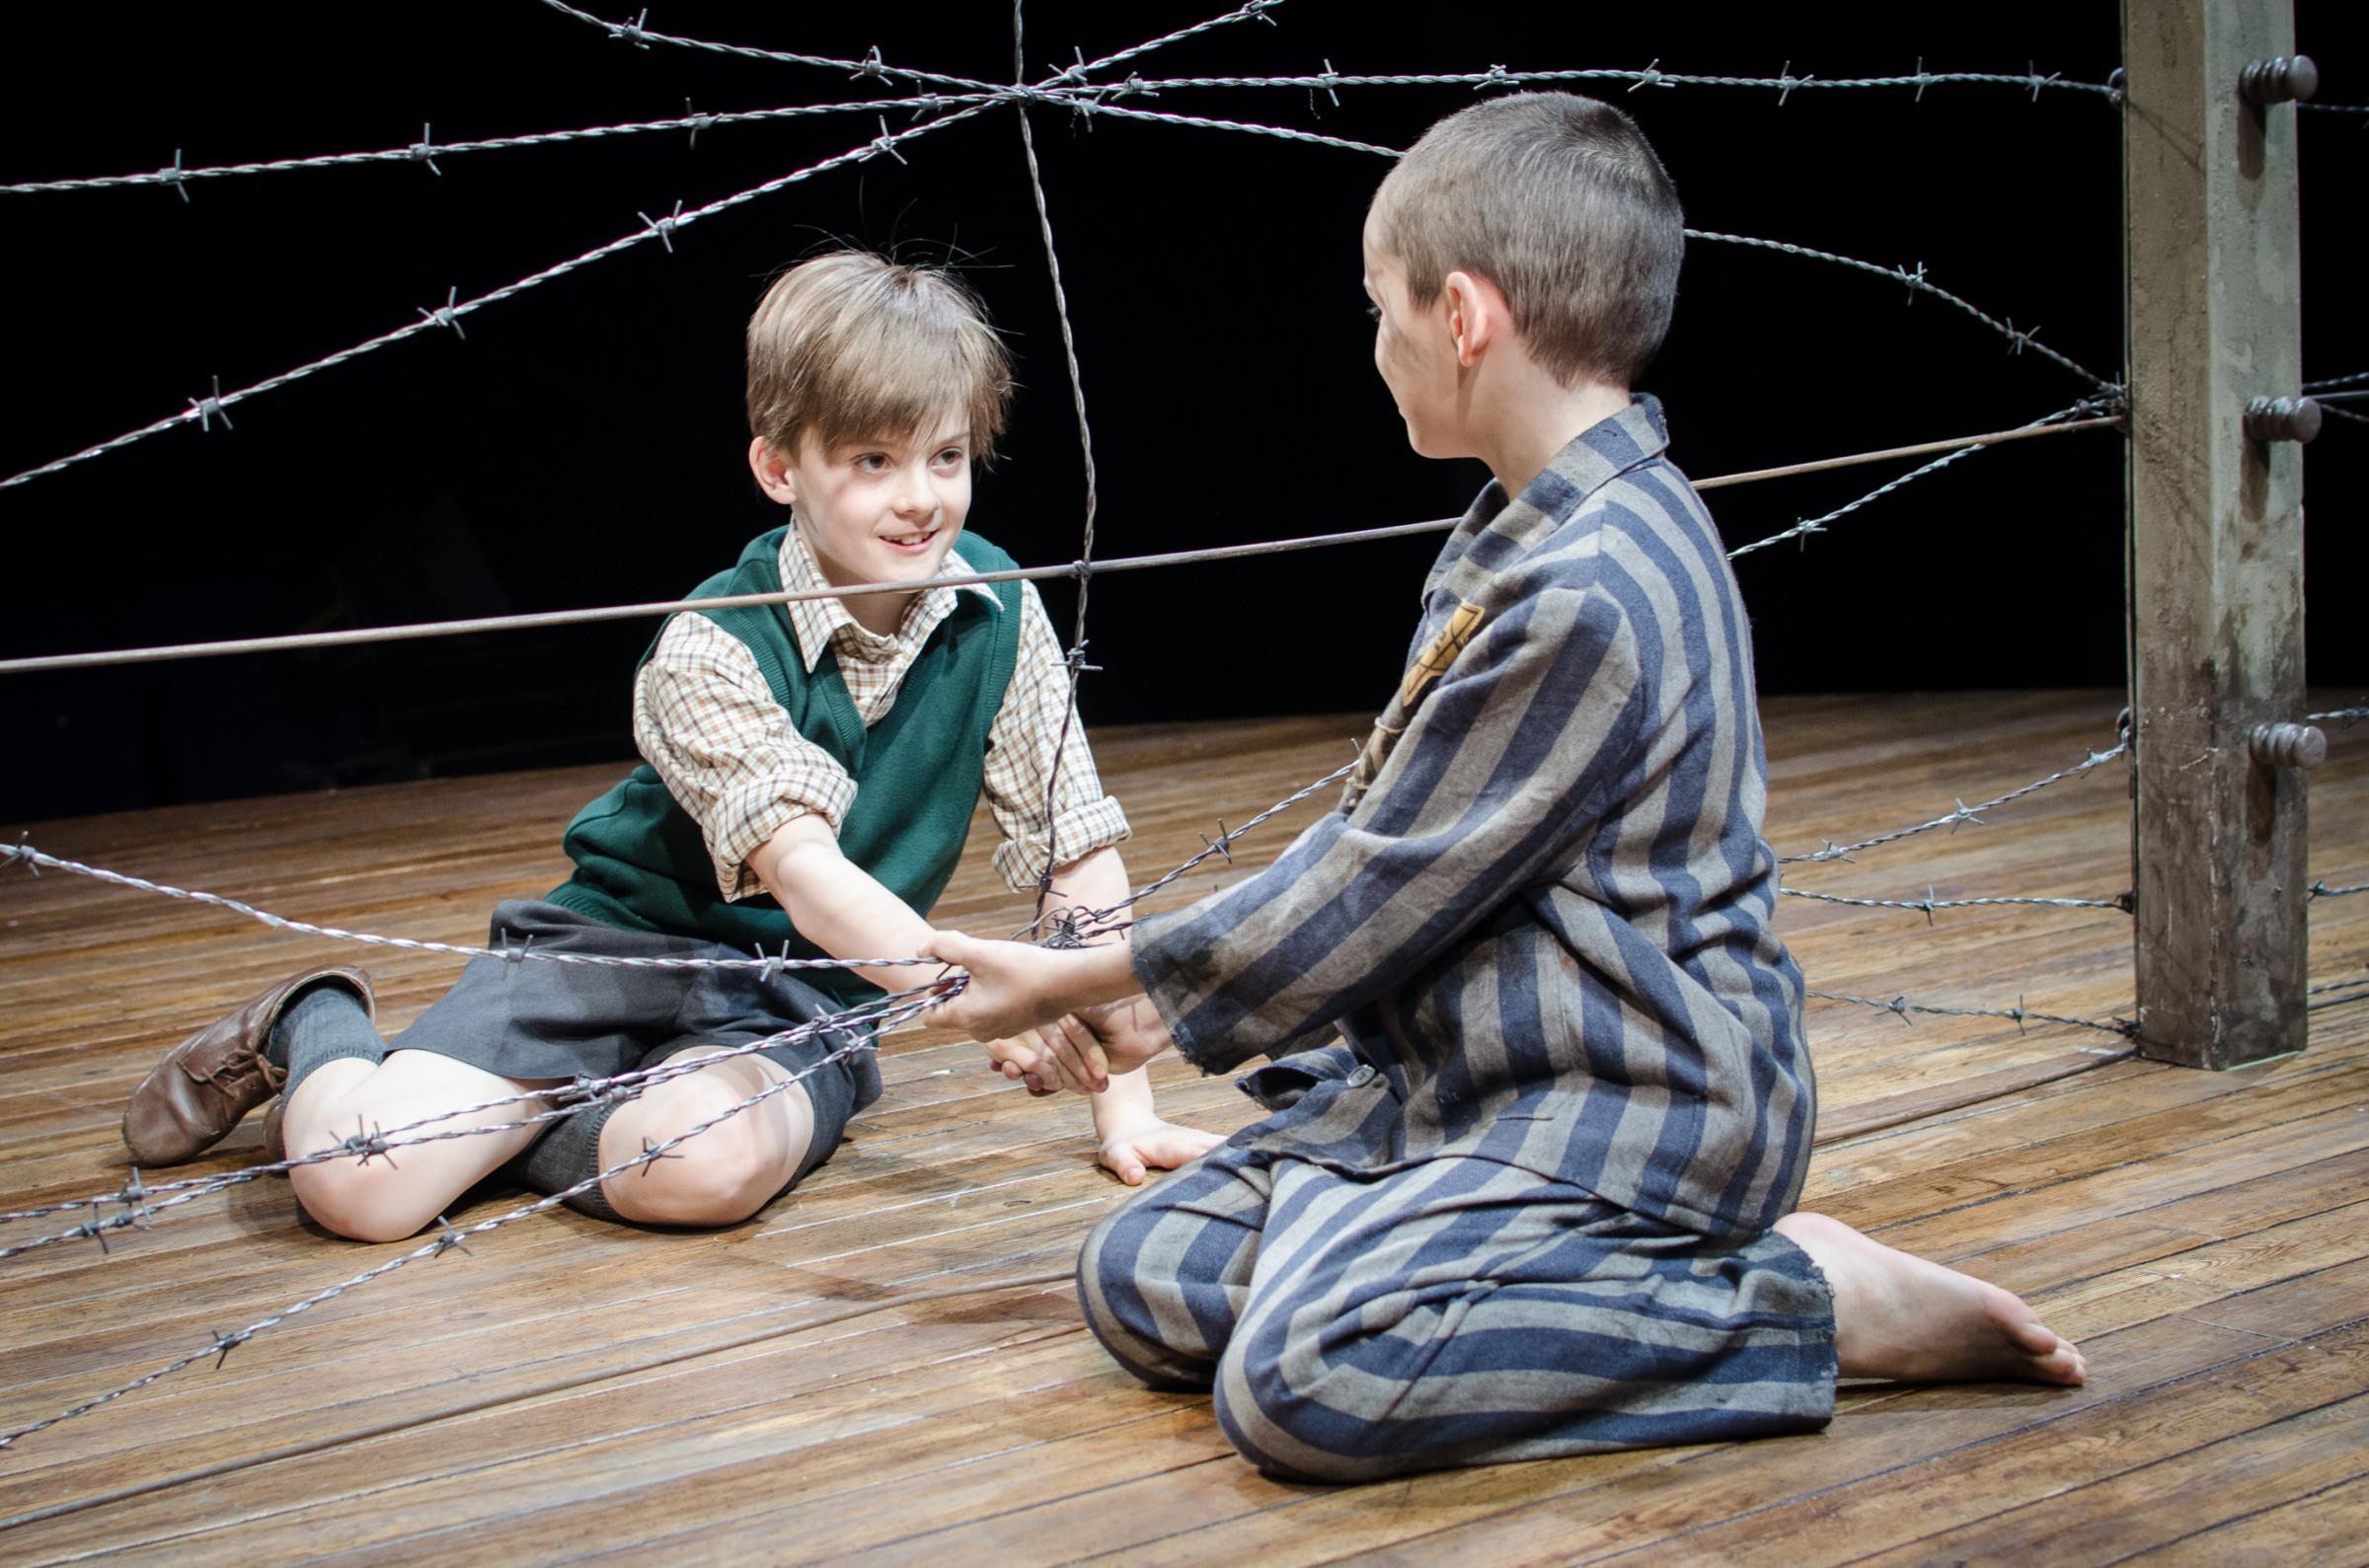 shmuel boy in the striped pyjamas